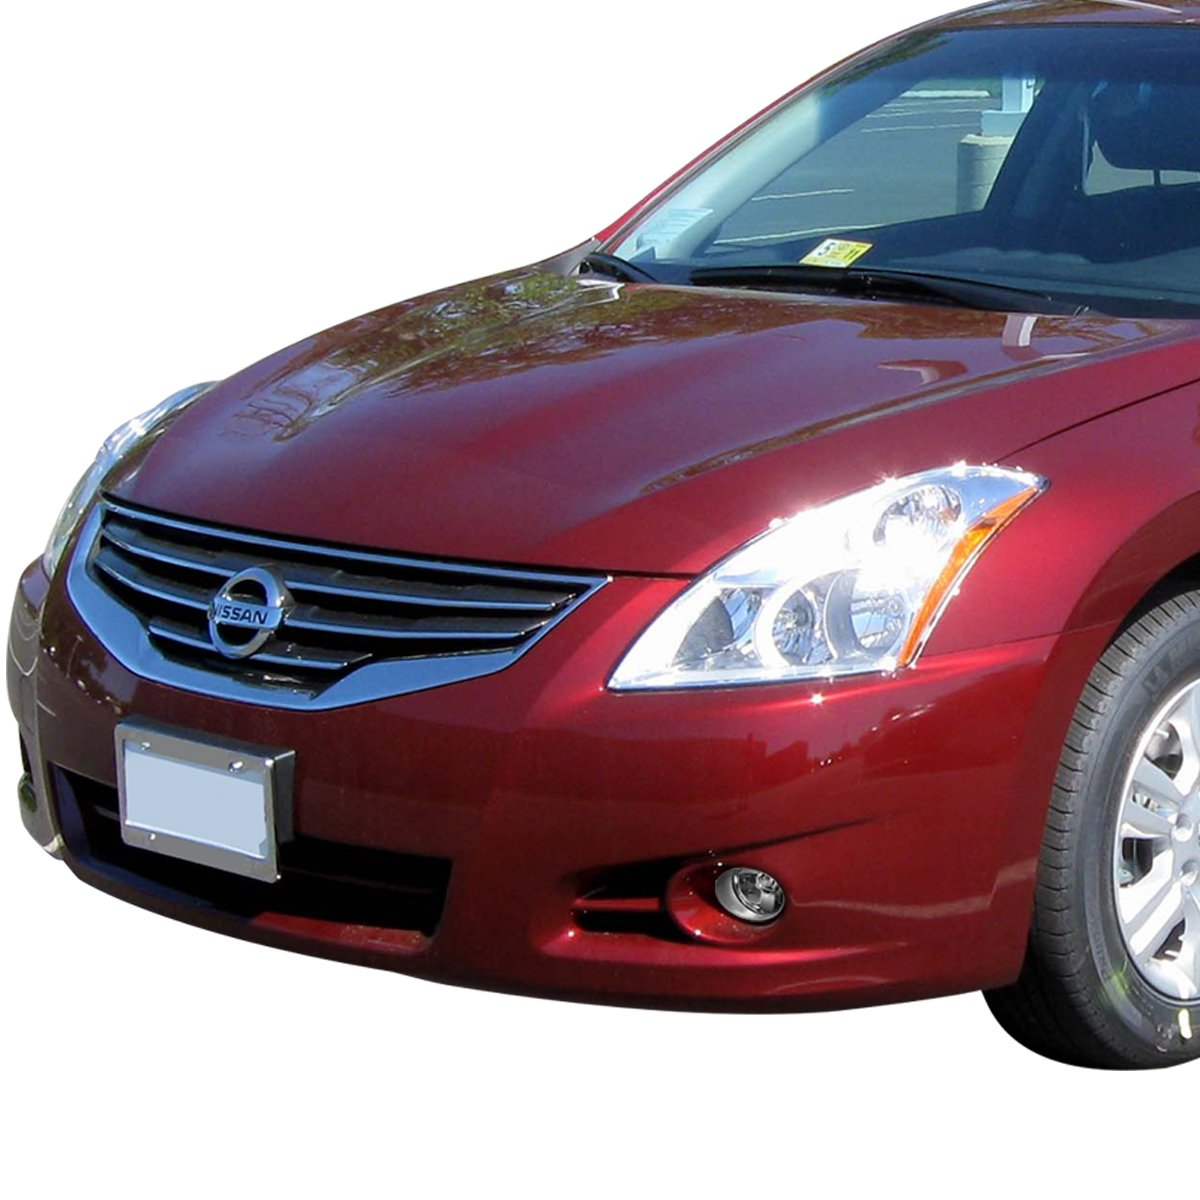 For Nissan Altima Fog Light Lamps Switch Blubs Clear Infiniti Lights Wiring Diagram Lens 4 Door Seden Automotive